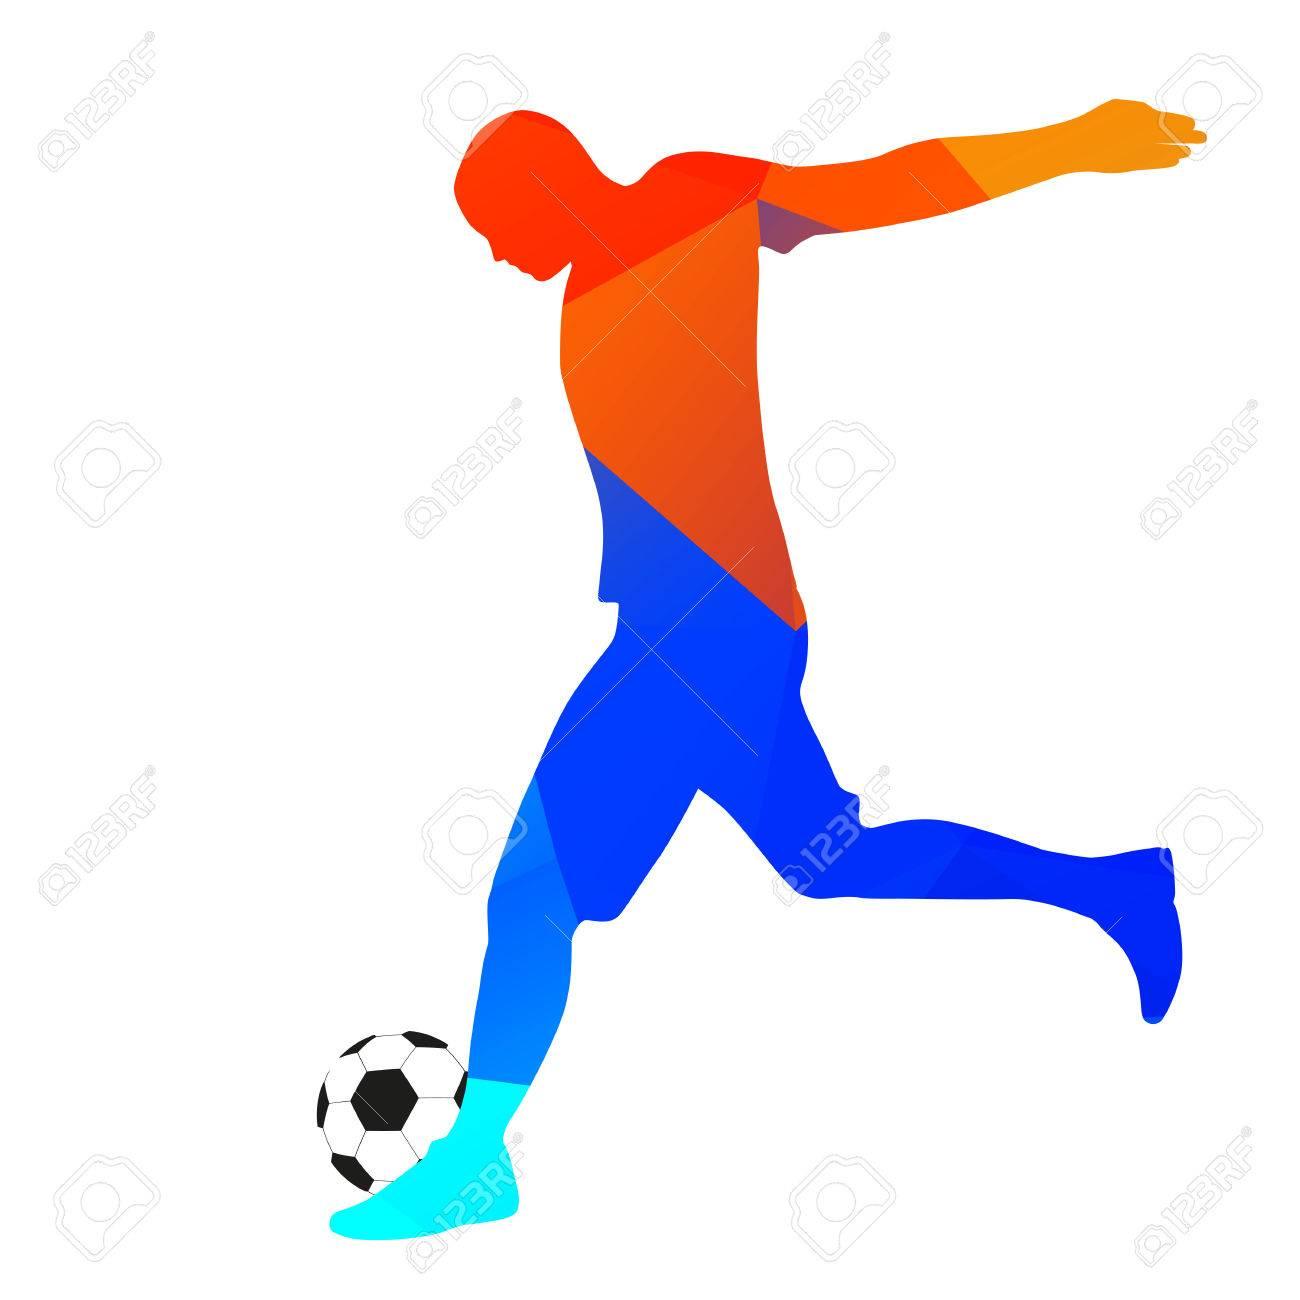 1300x1300 Geometric Drawing Footballer Kicking A Ball Royalty Free Cliparts